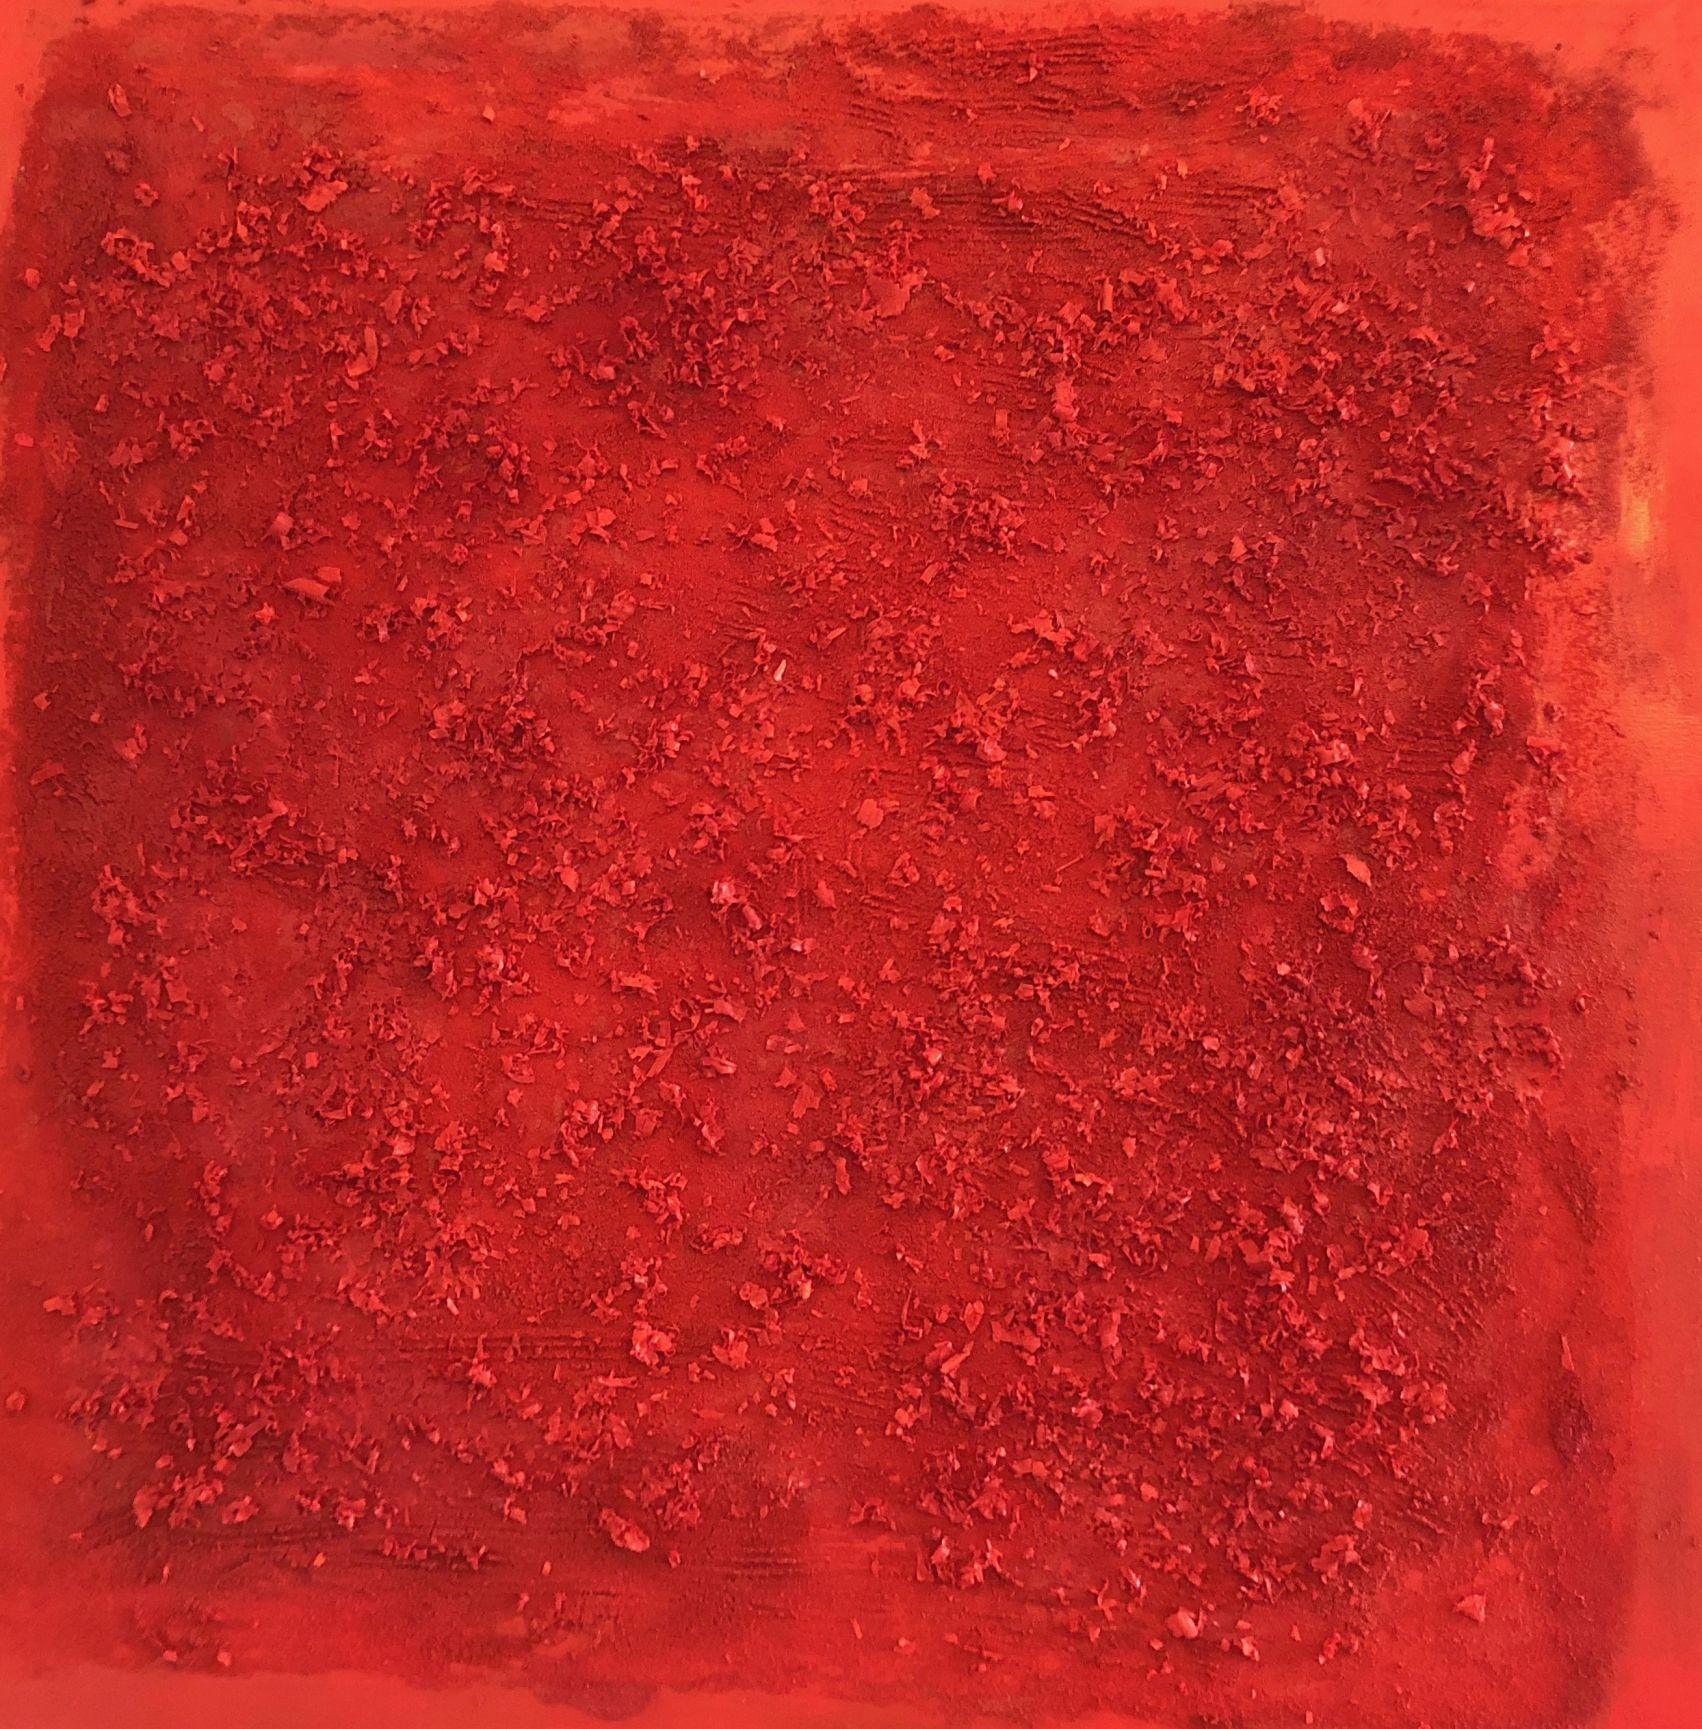 Cosmogonía textura rojo (2017) - Isabel Valdecasas - Isabelita